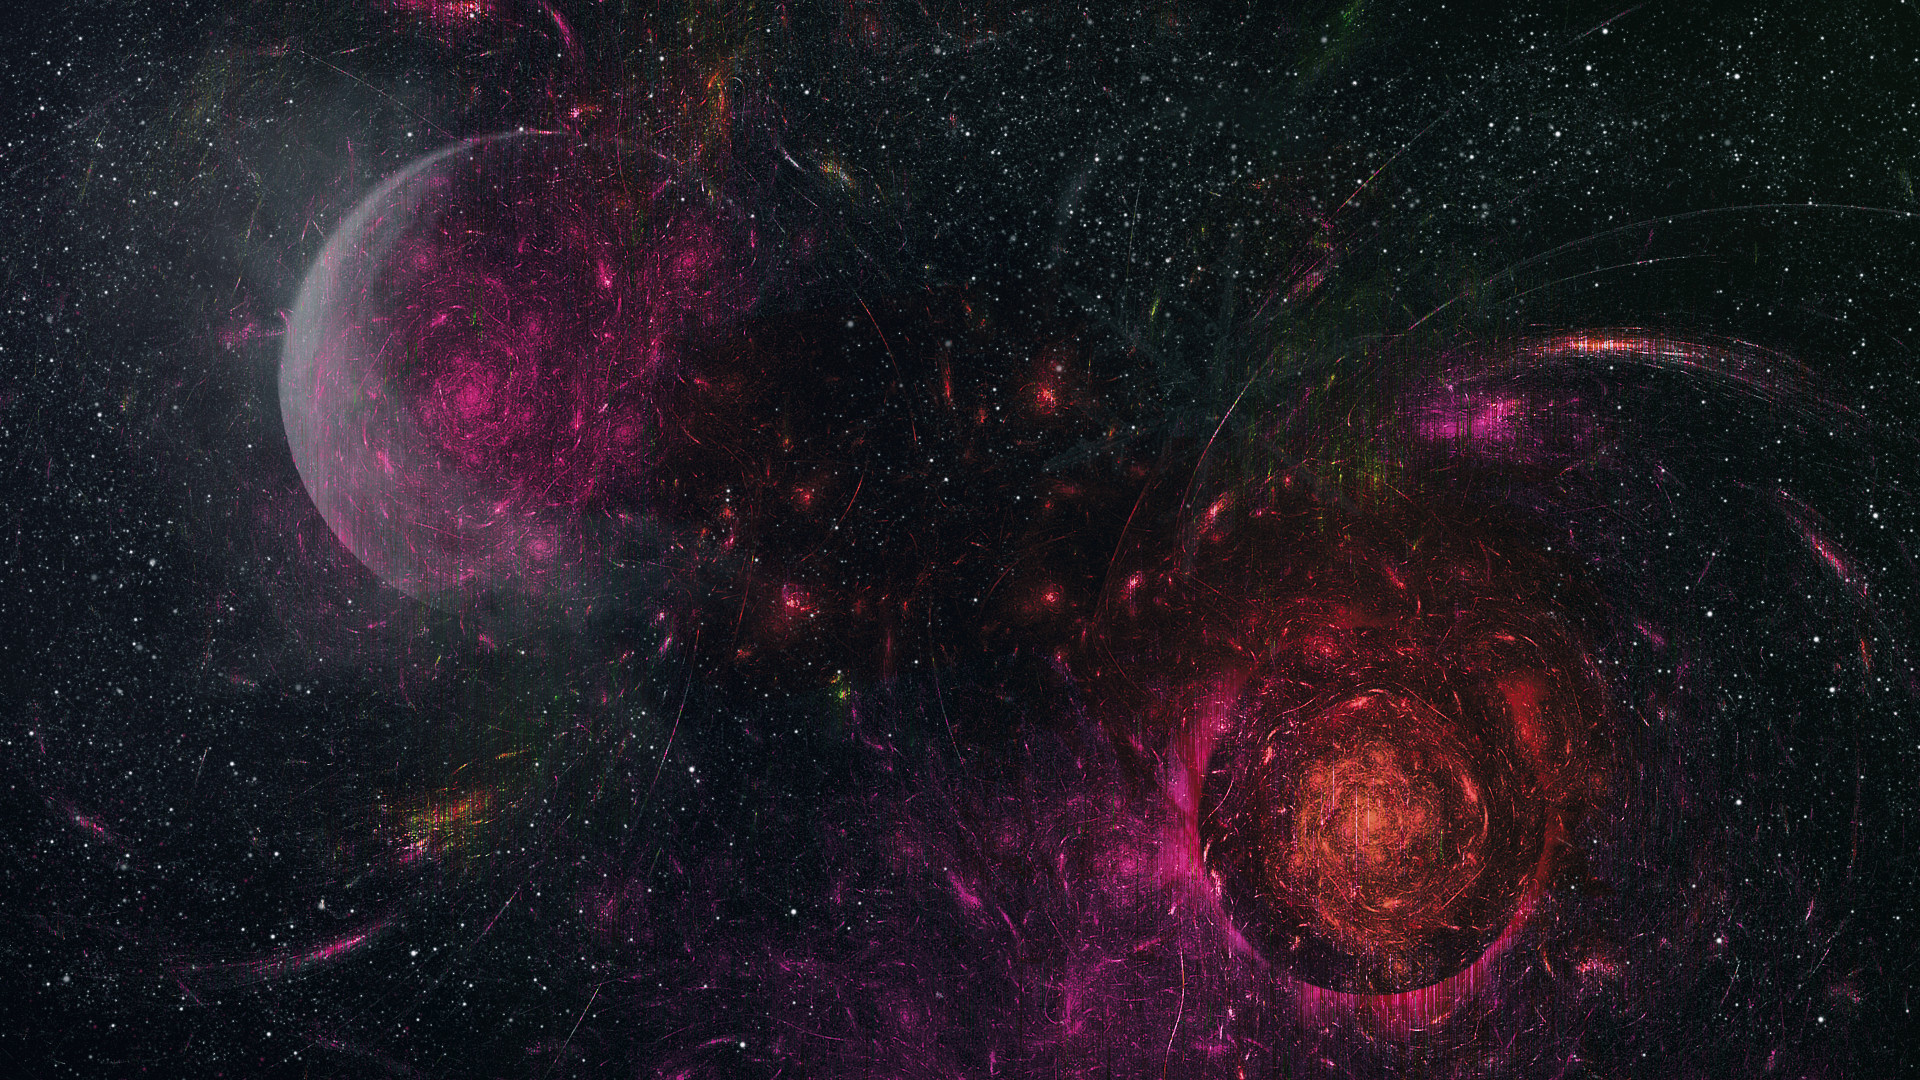 Kresimir jelusic robob3ar 221 200516 starlight